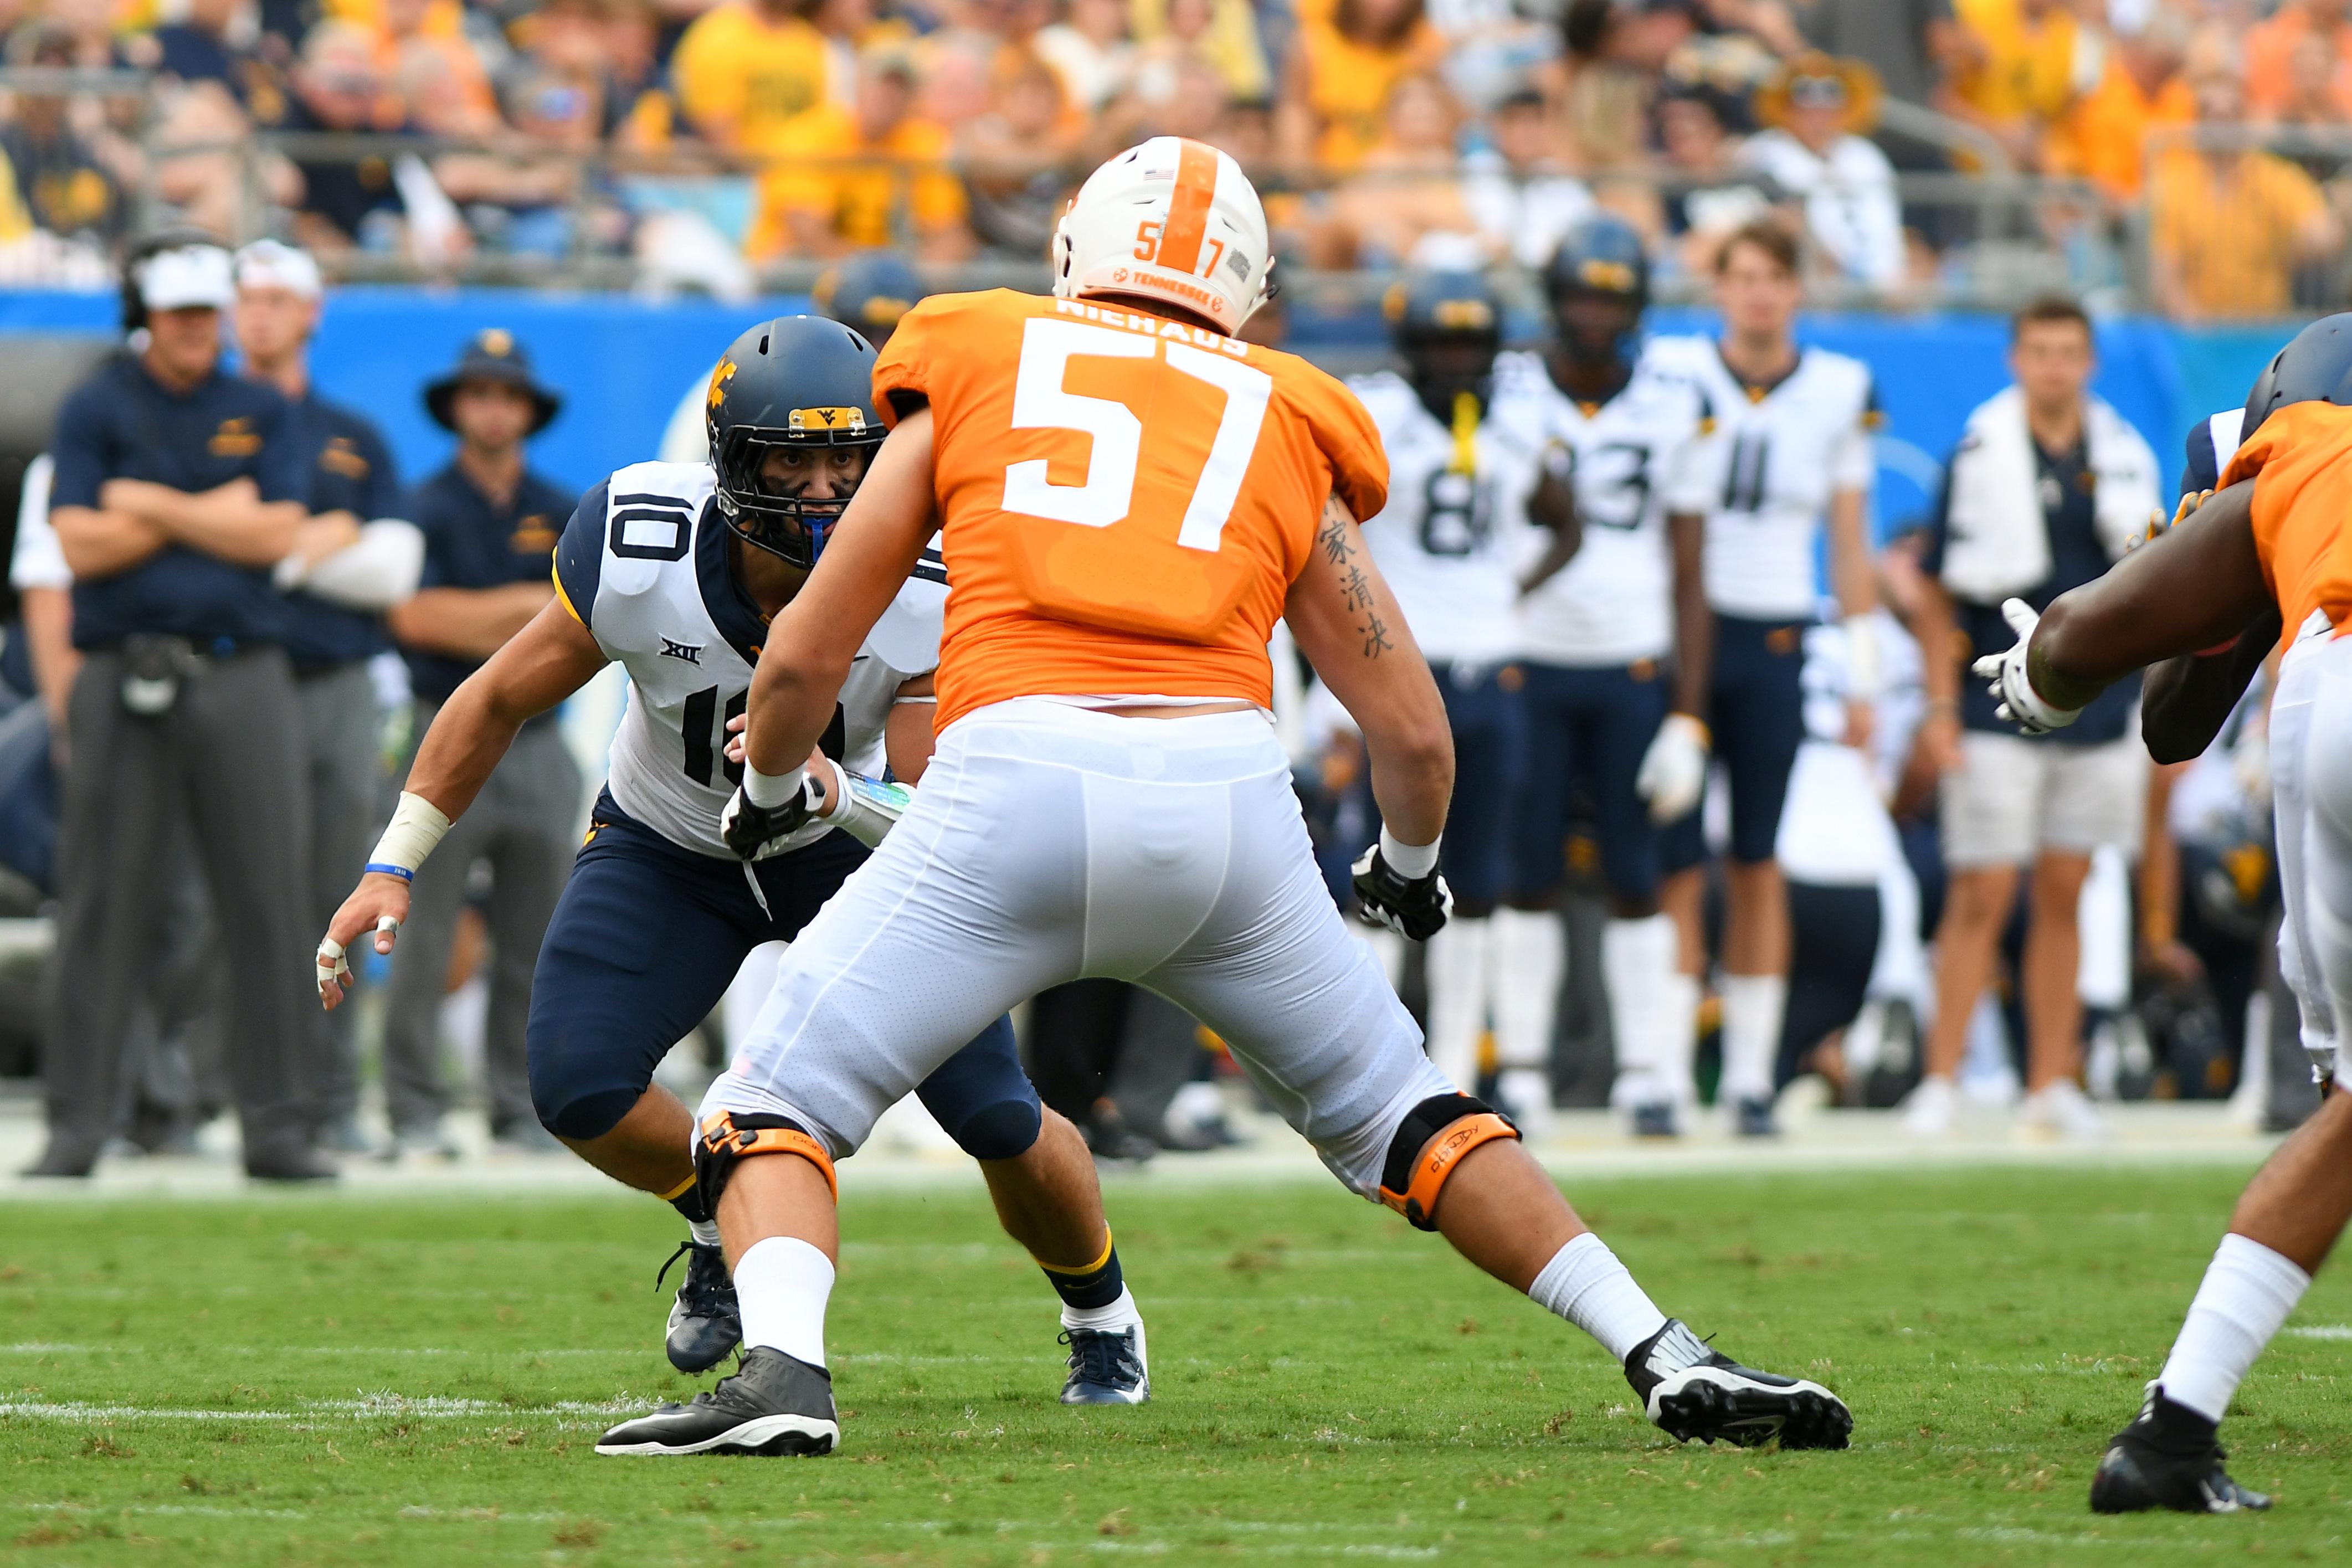 COLLEGE FOOTBALL: SEP 01 Belk College Kickoff - Tennessee v West Virginia